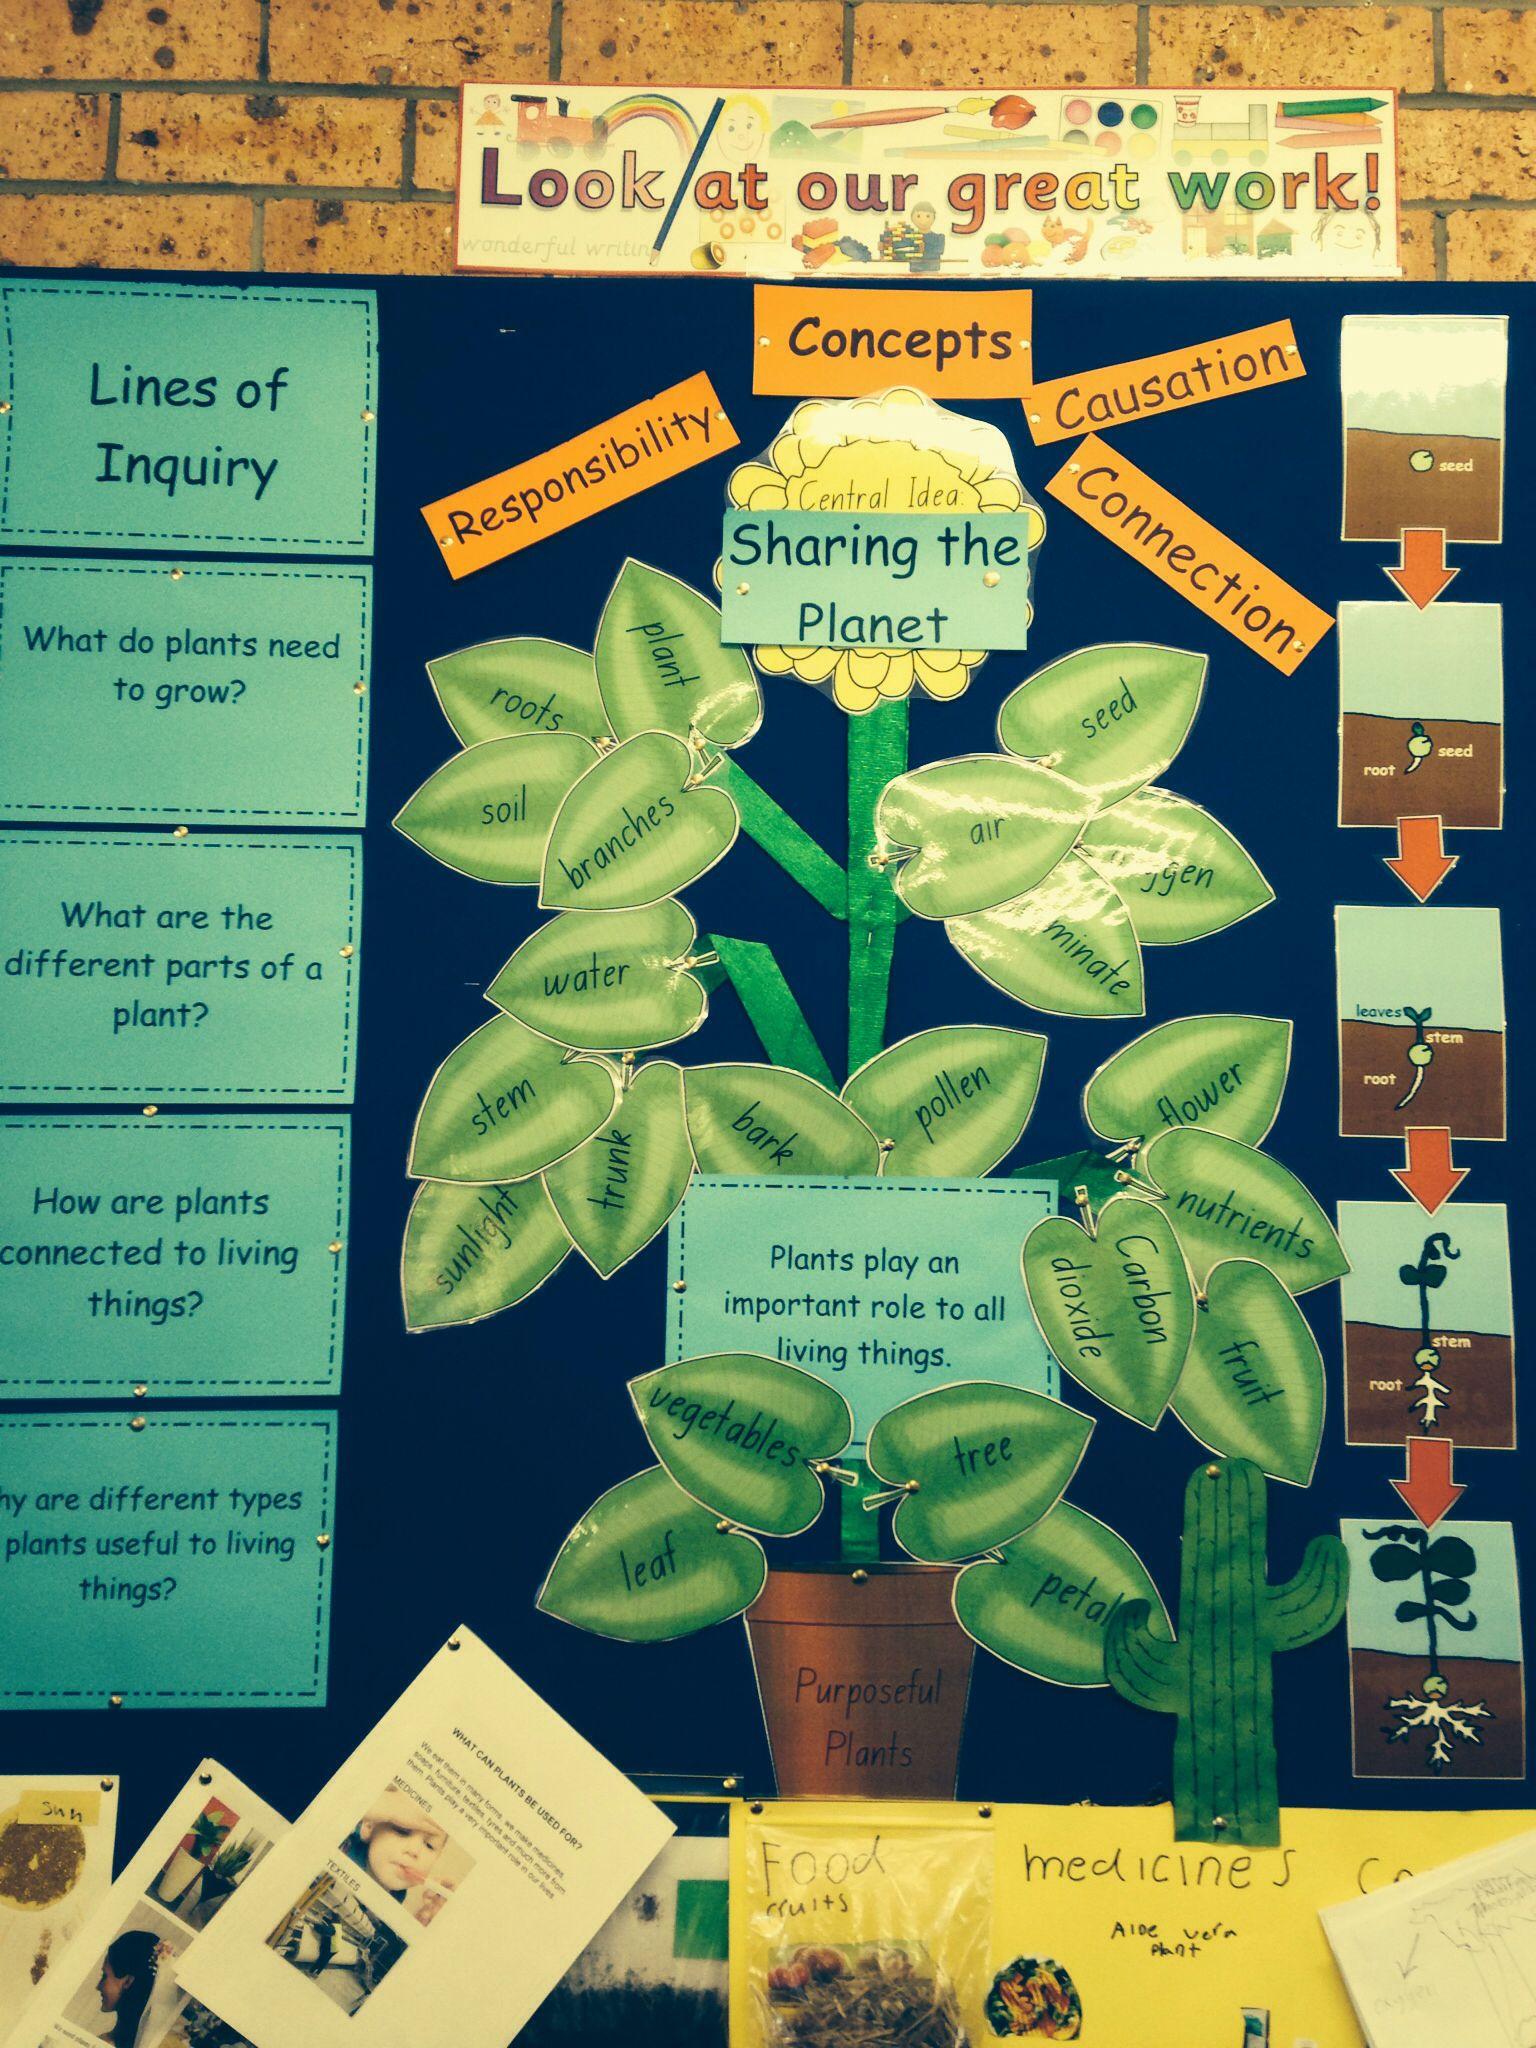 Purposeful Plants